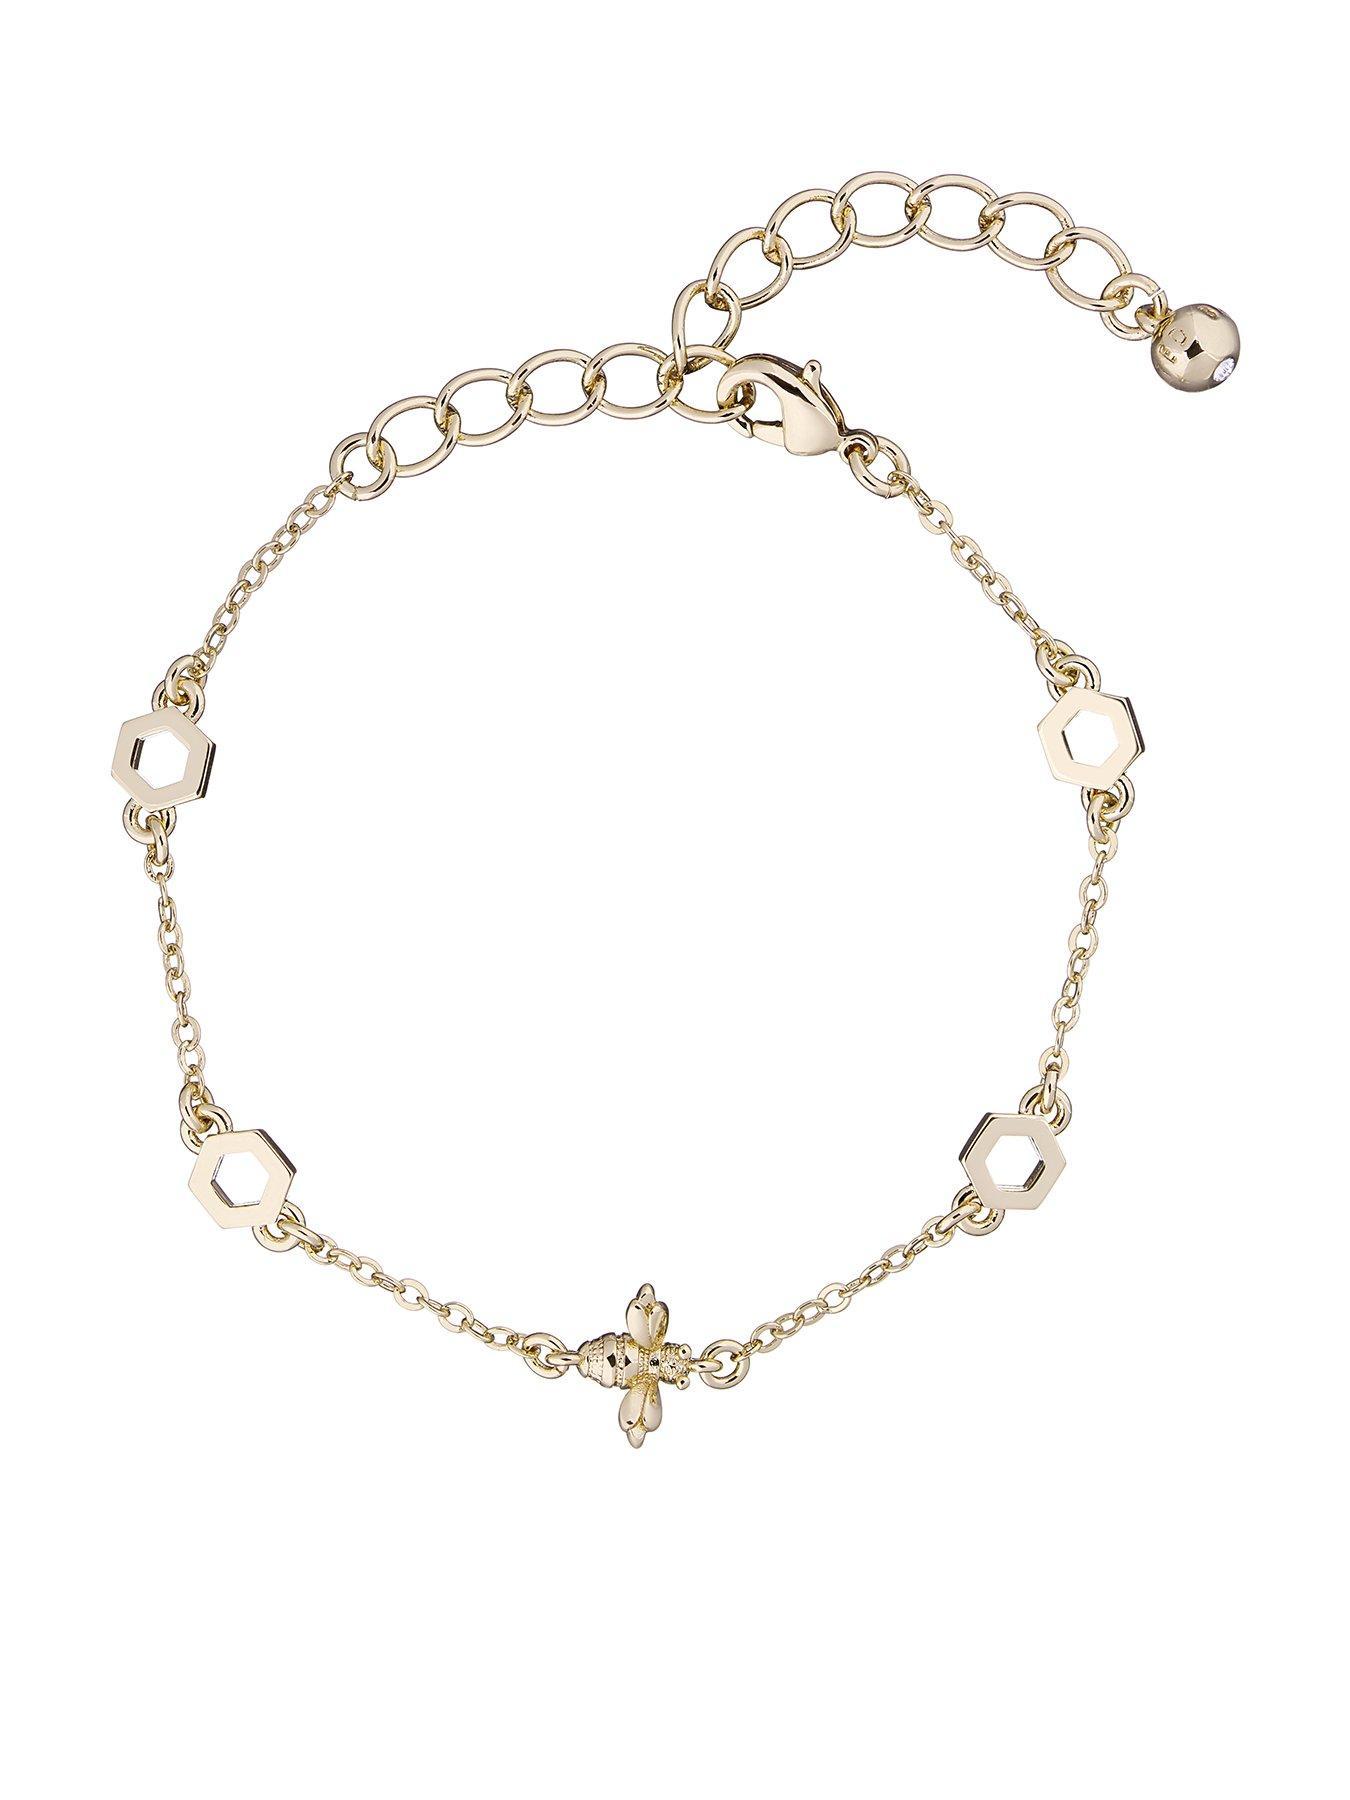 Pretty Soft Black Leather Womens Slim Gold Leaf Charm Bracelet Bangle Gift Boxed